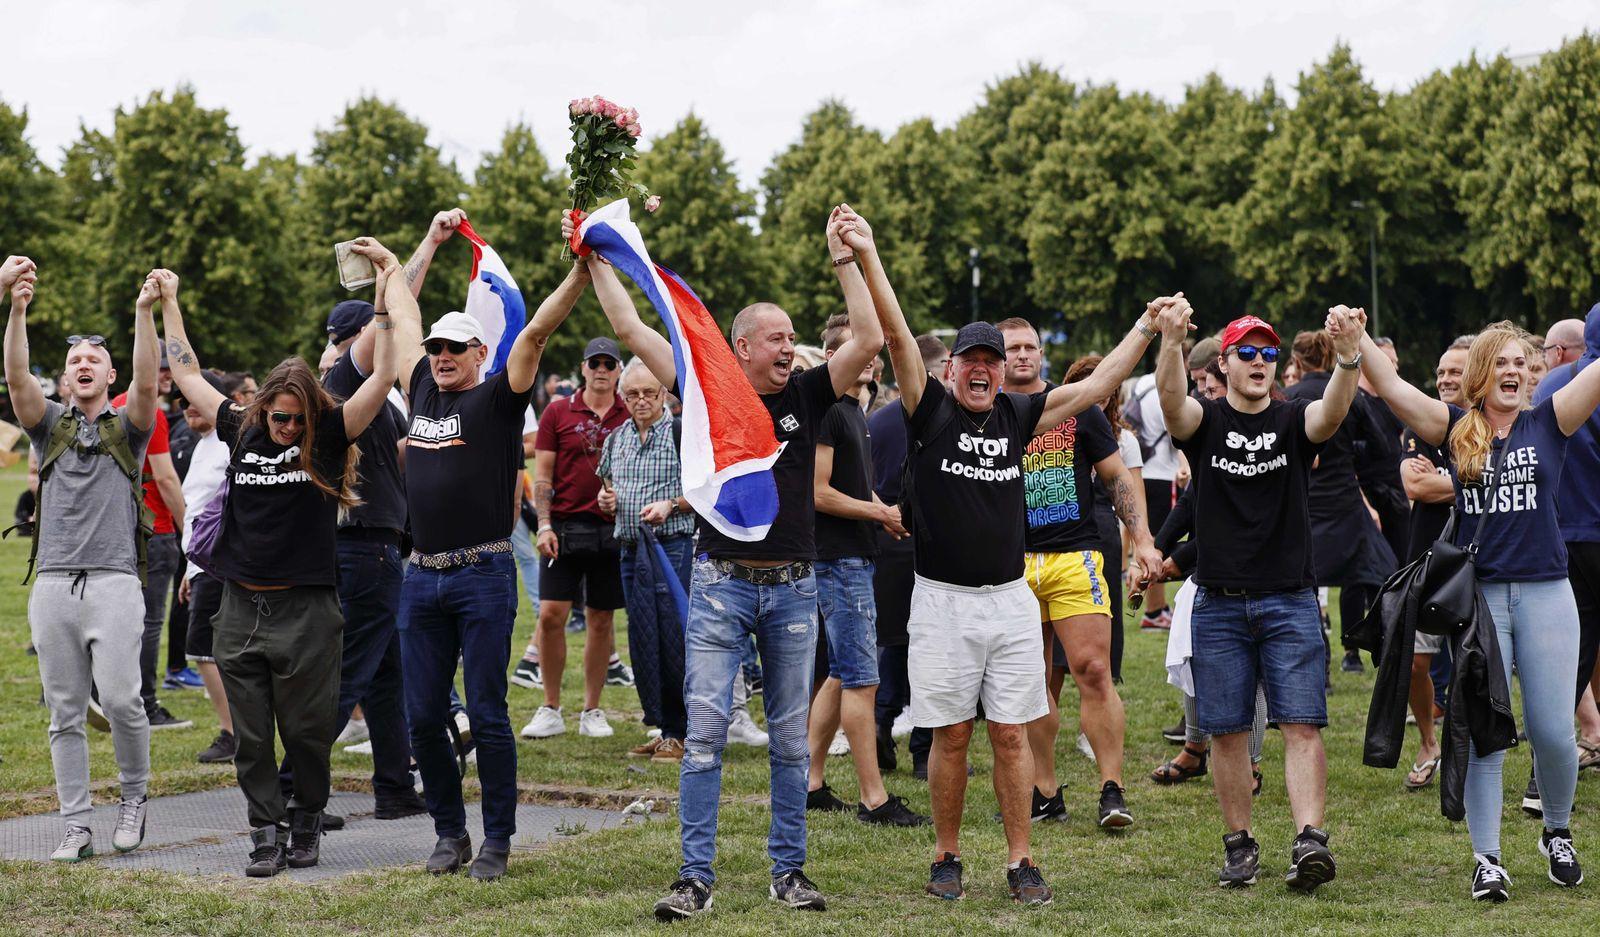 Despite prohibition, protesters at Malieveld, Den Haag, Netherlands - 21 Jun 2020